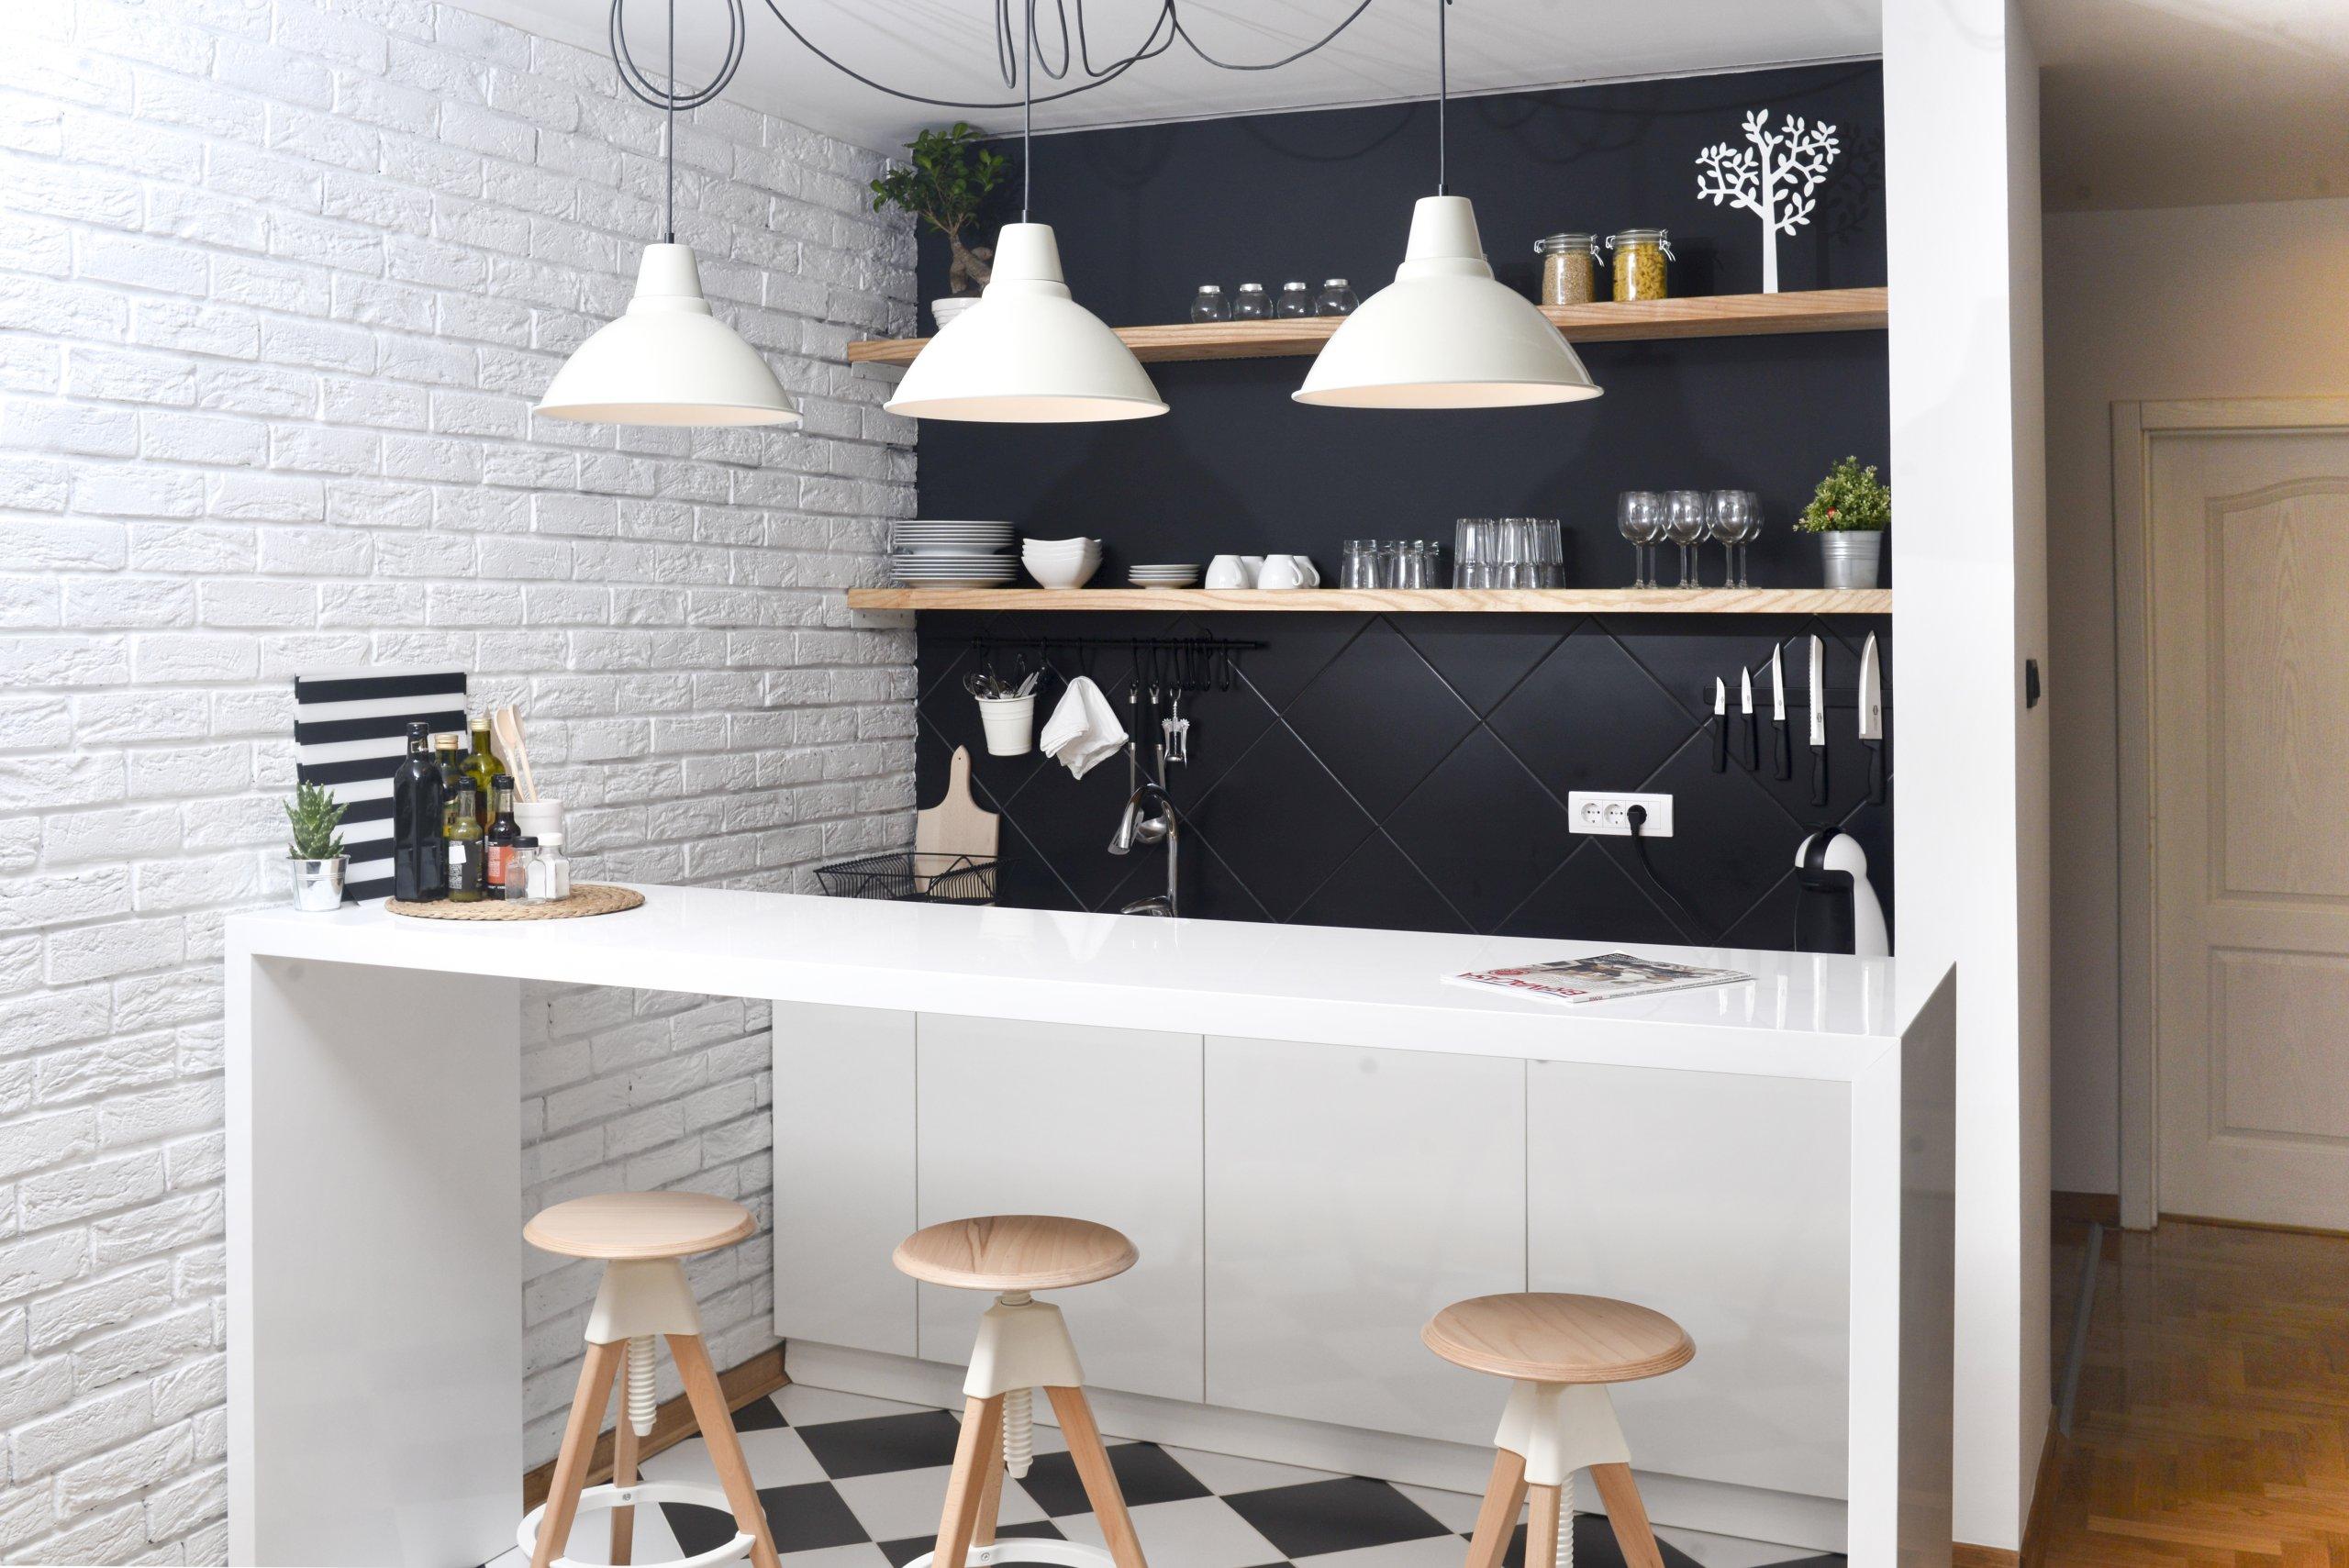 Home bar renovation